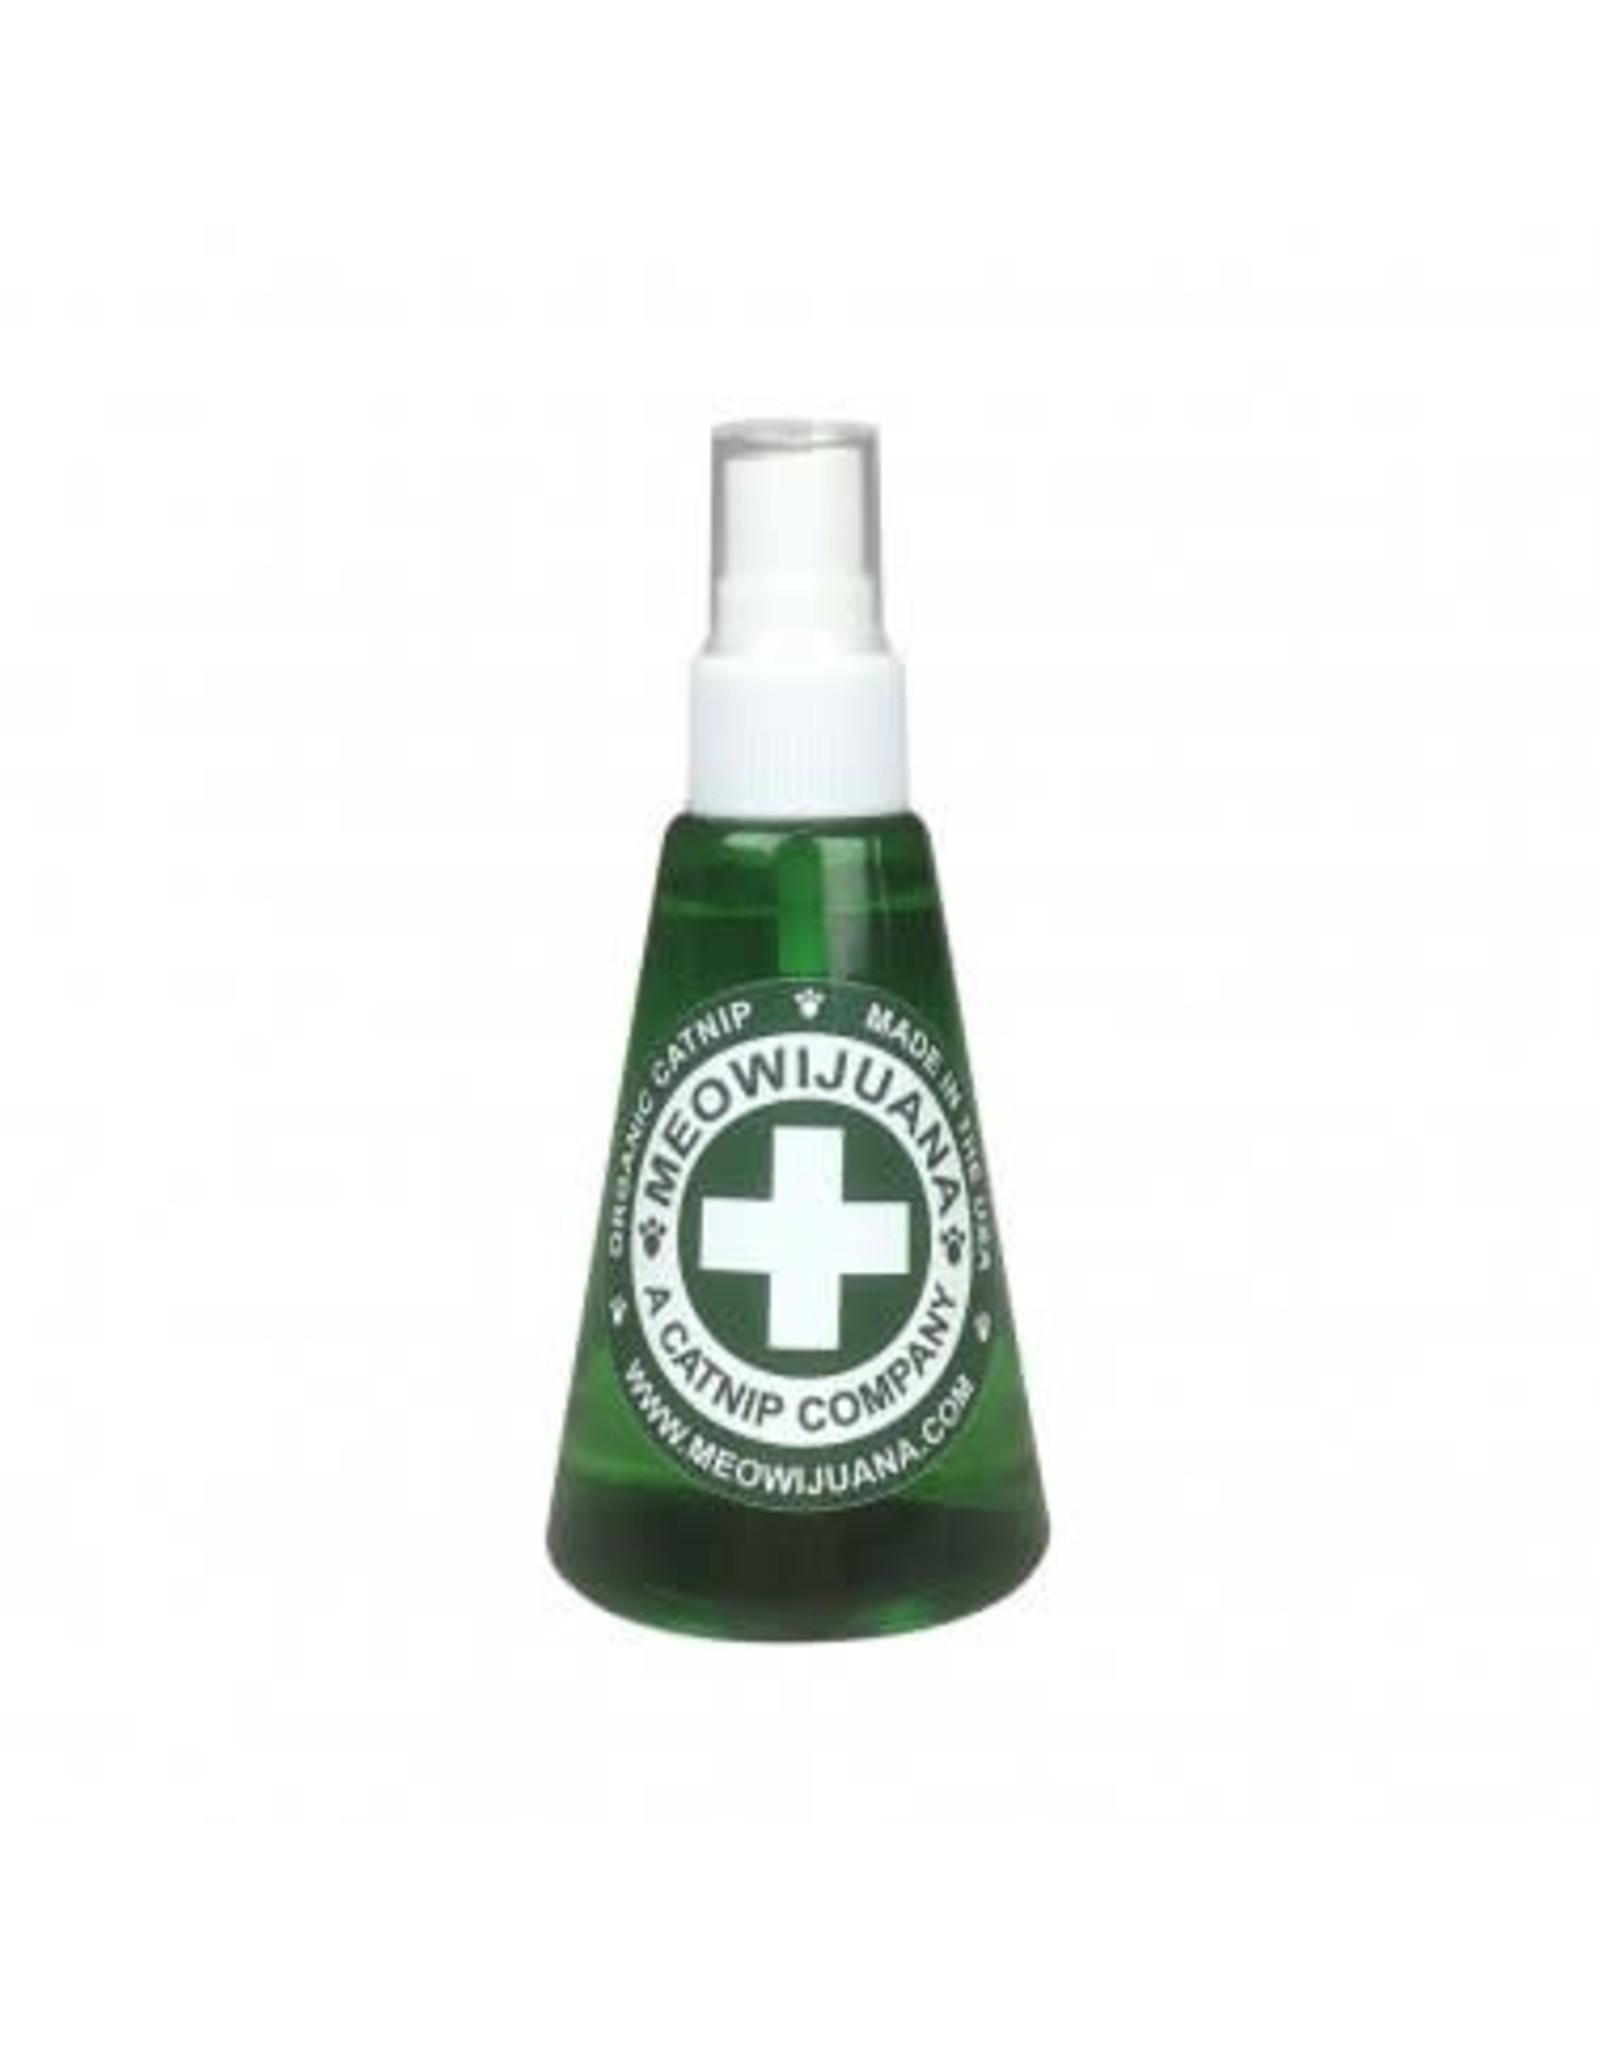 Meowijuana Meowijuana Catnip Spray 3oz